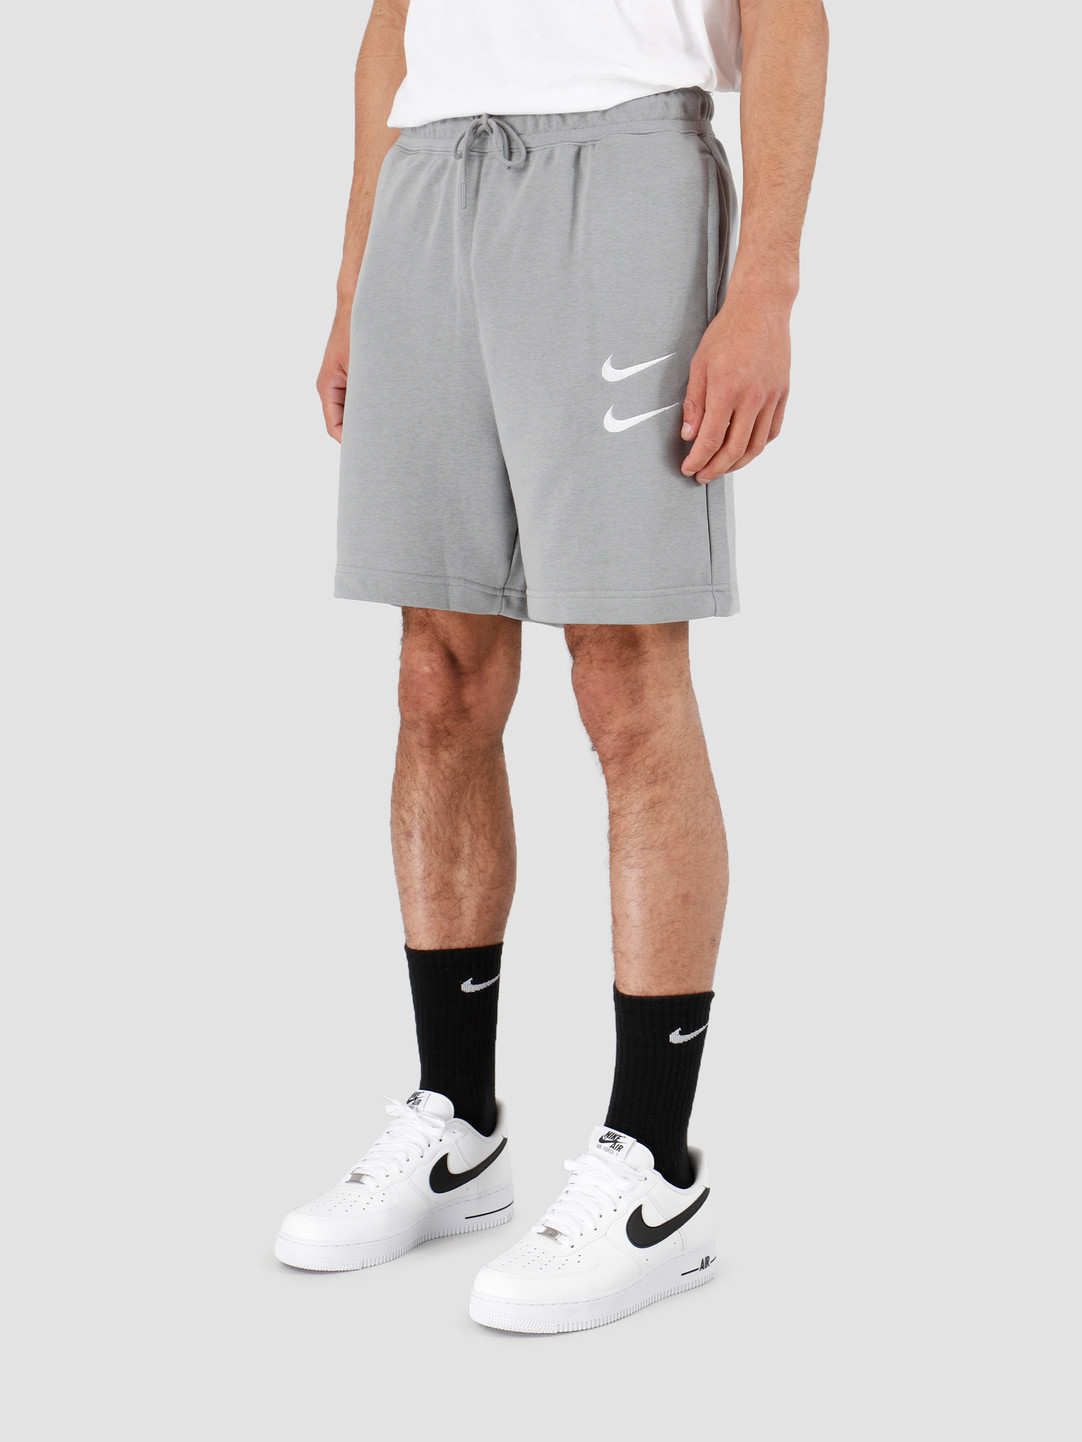 Nike Nike NSW Swoosh Short Ft Particle Grey White CJ4882-073